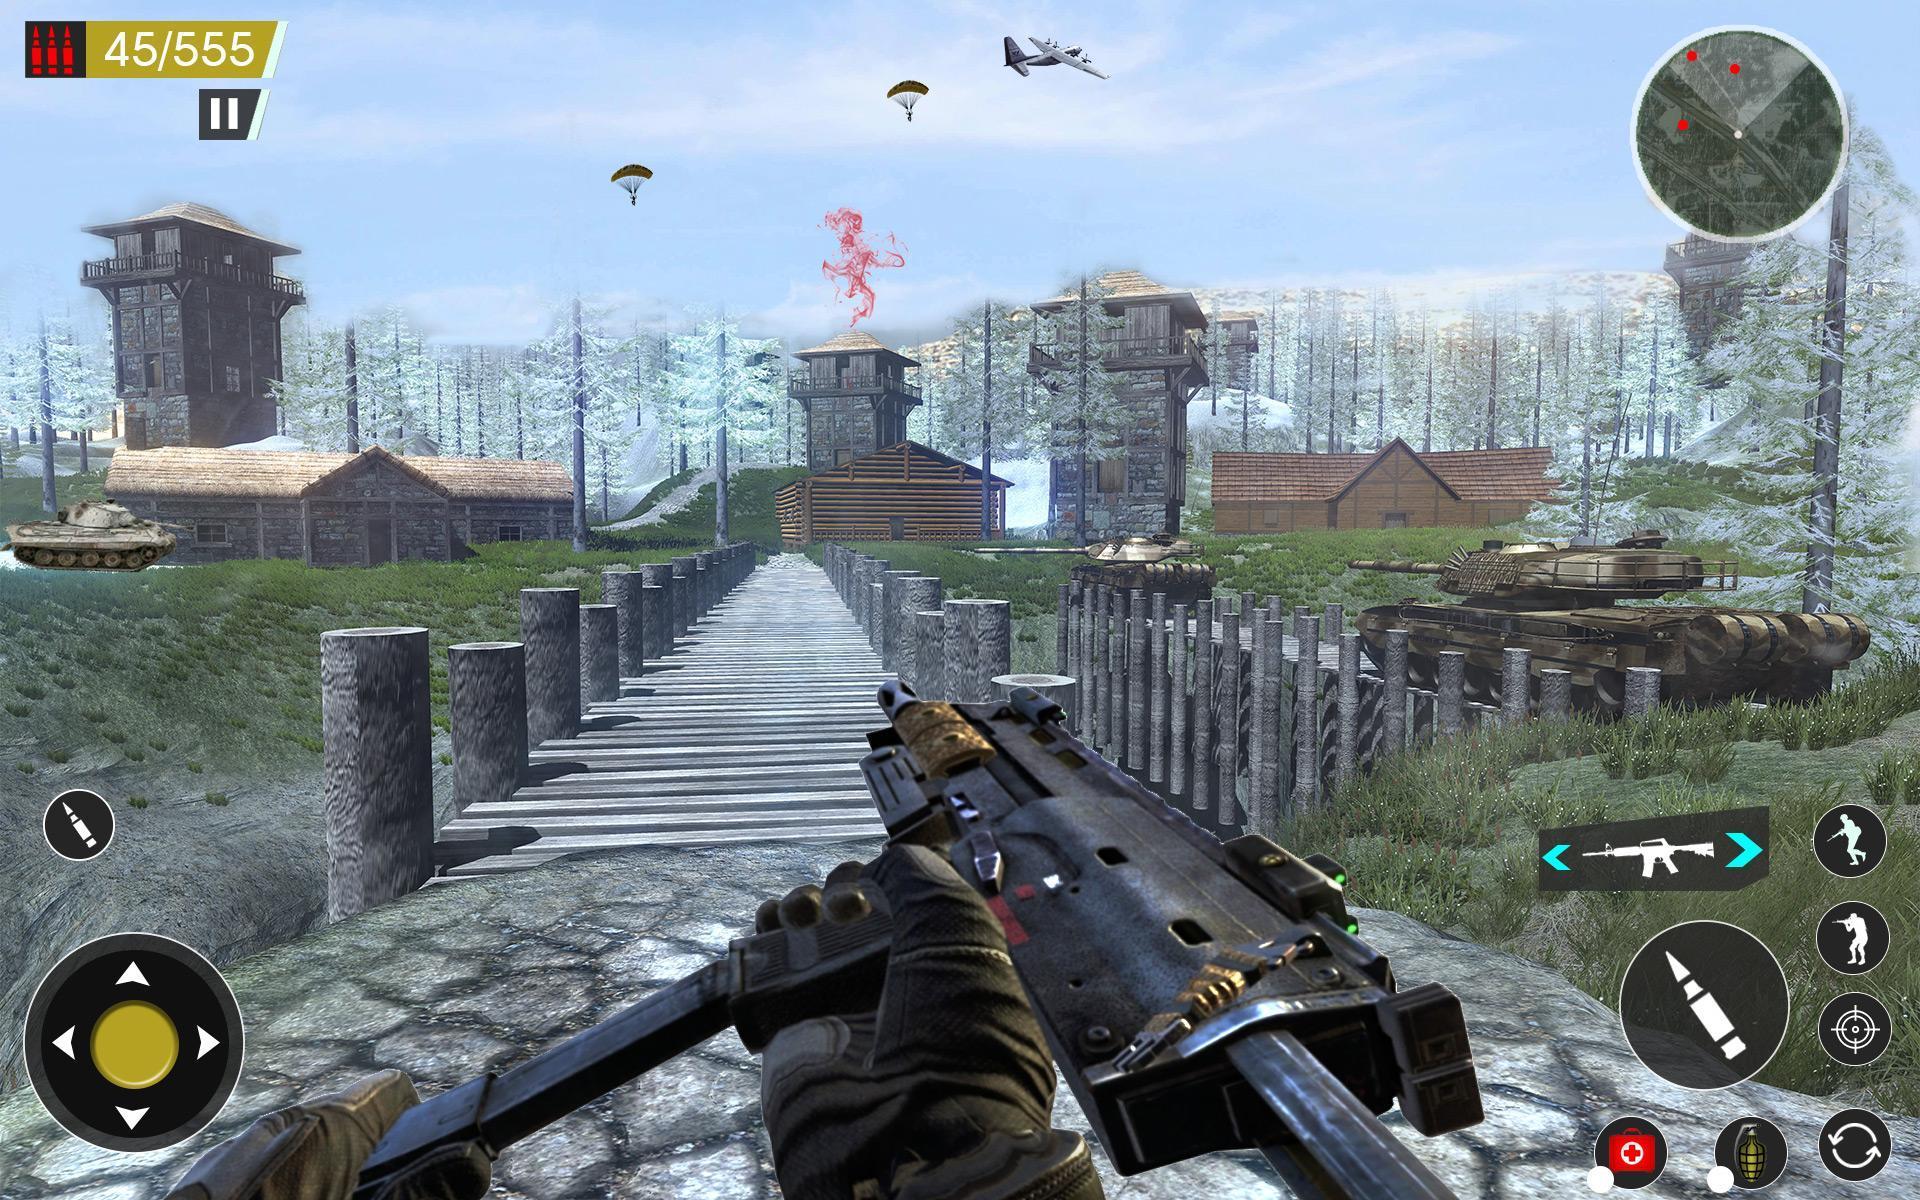 American World War Fps Shooter Free Shooting Games 4.8 Screenshot 11